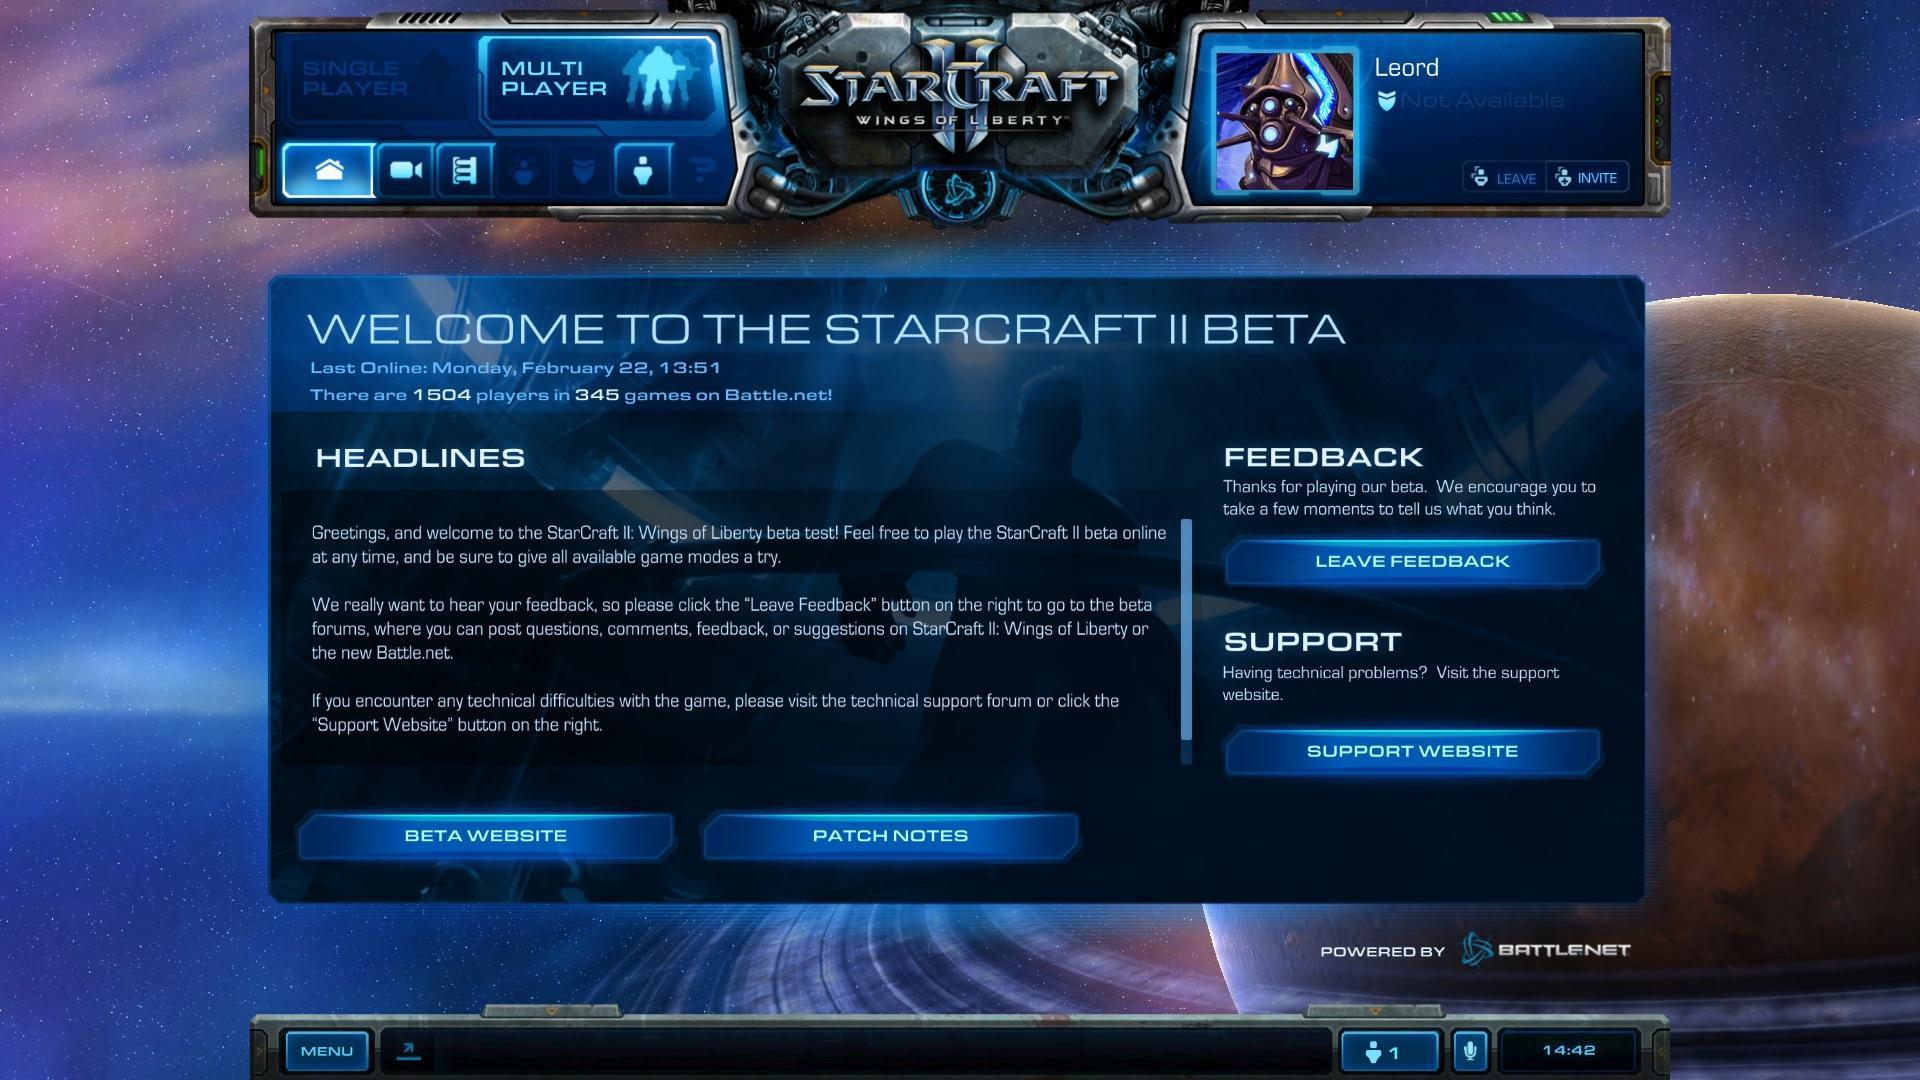 StarCraft II - Immagini dalla versione Beta